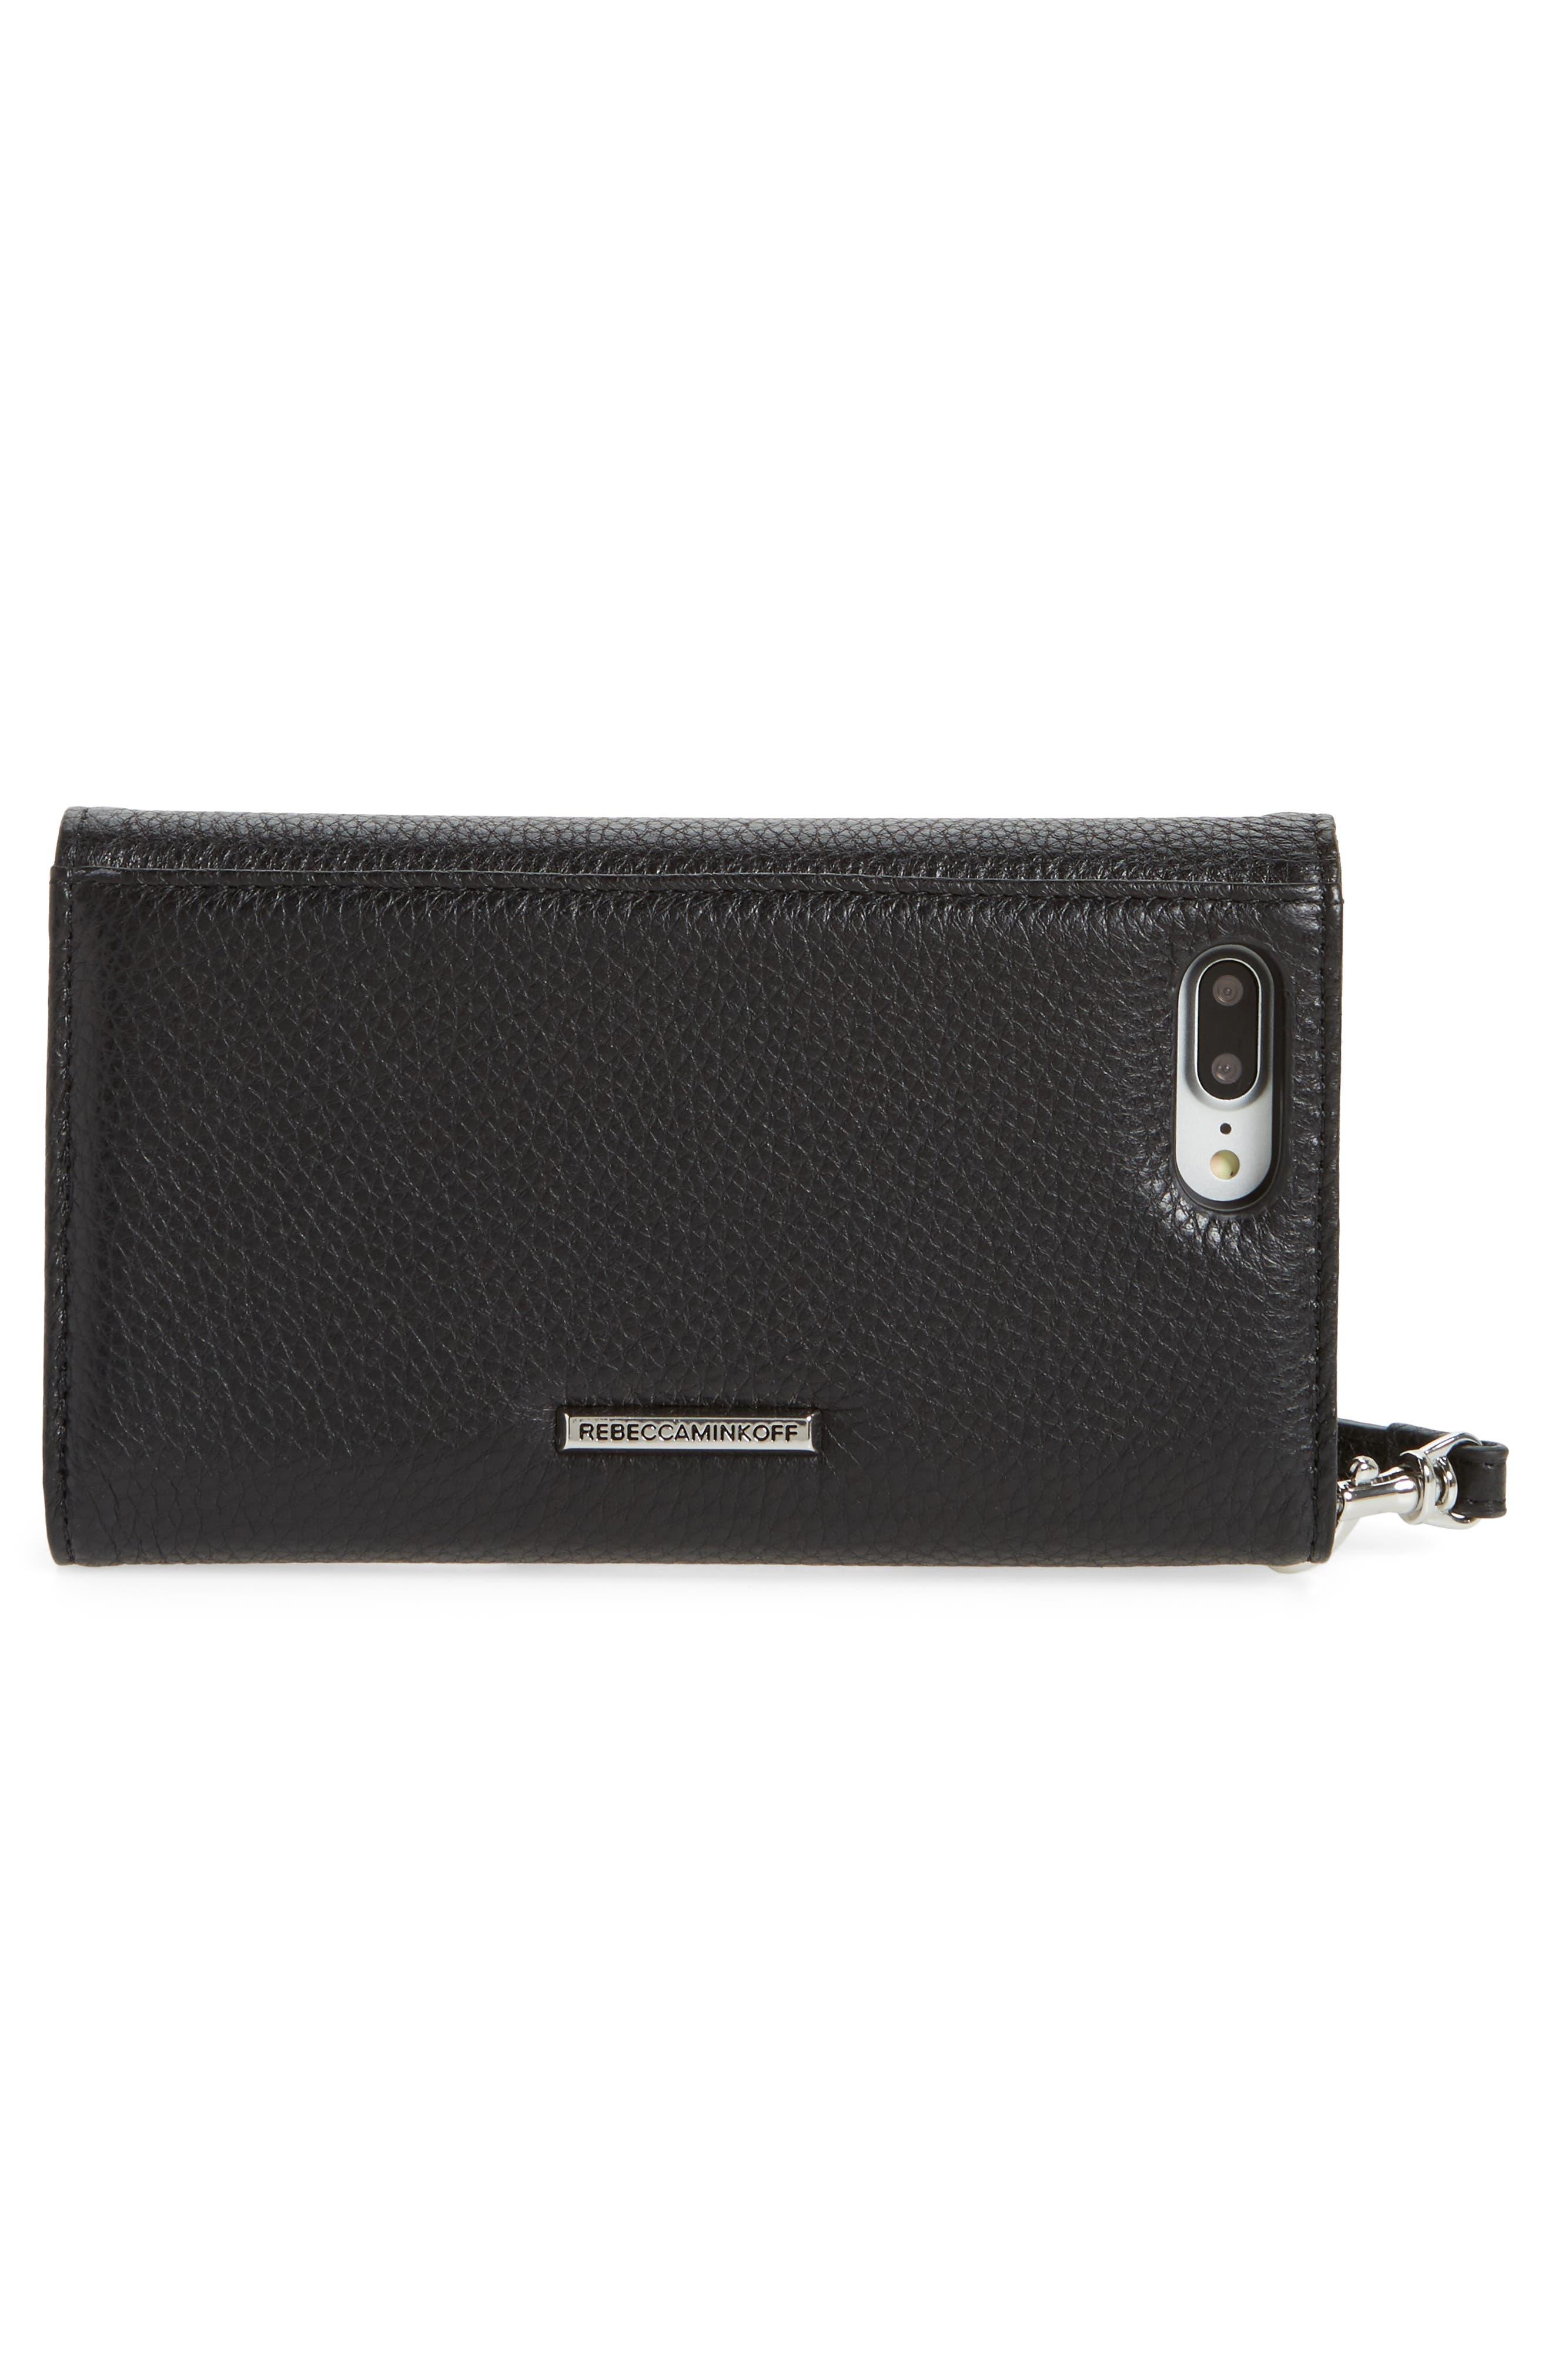 REBECCA MINKOFF,                             Love Lock iPhone 7/8 & 7/8 Plus Leather Wristlet Folio,                             Alternate thumbnail 3, color,                             001